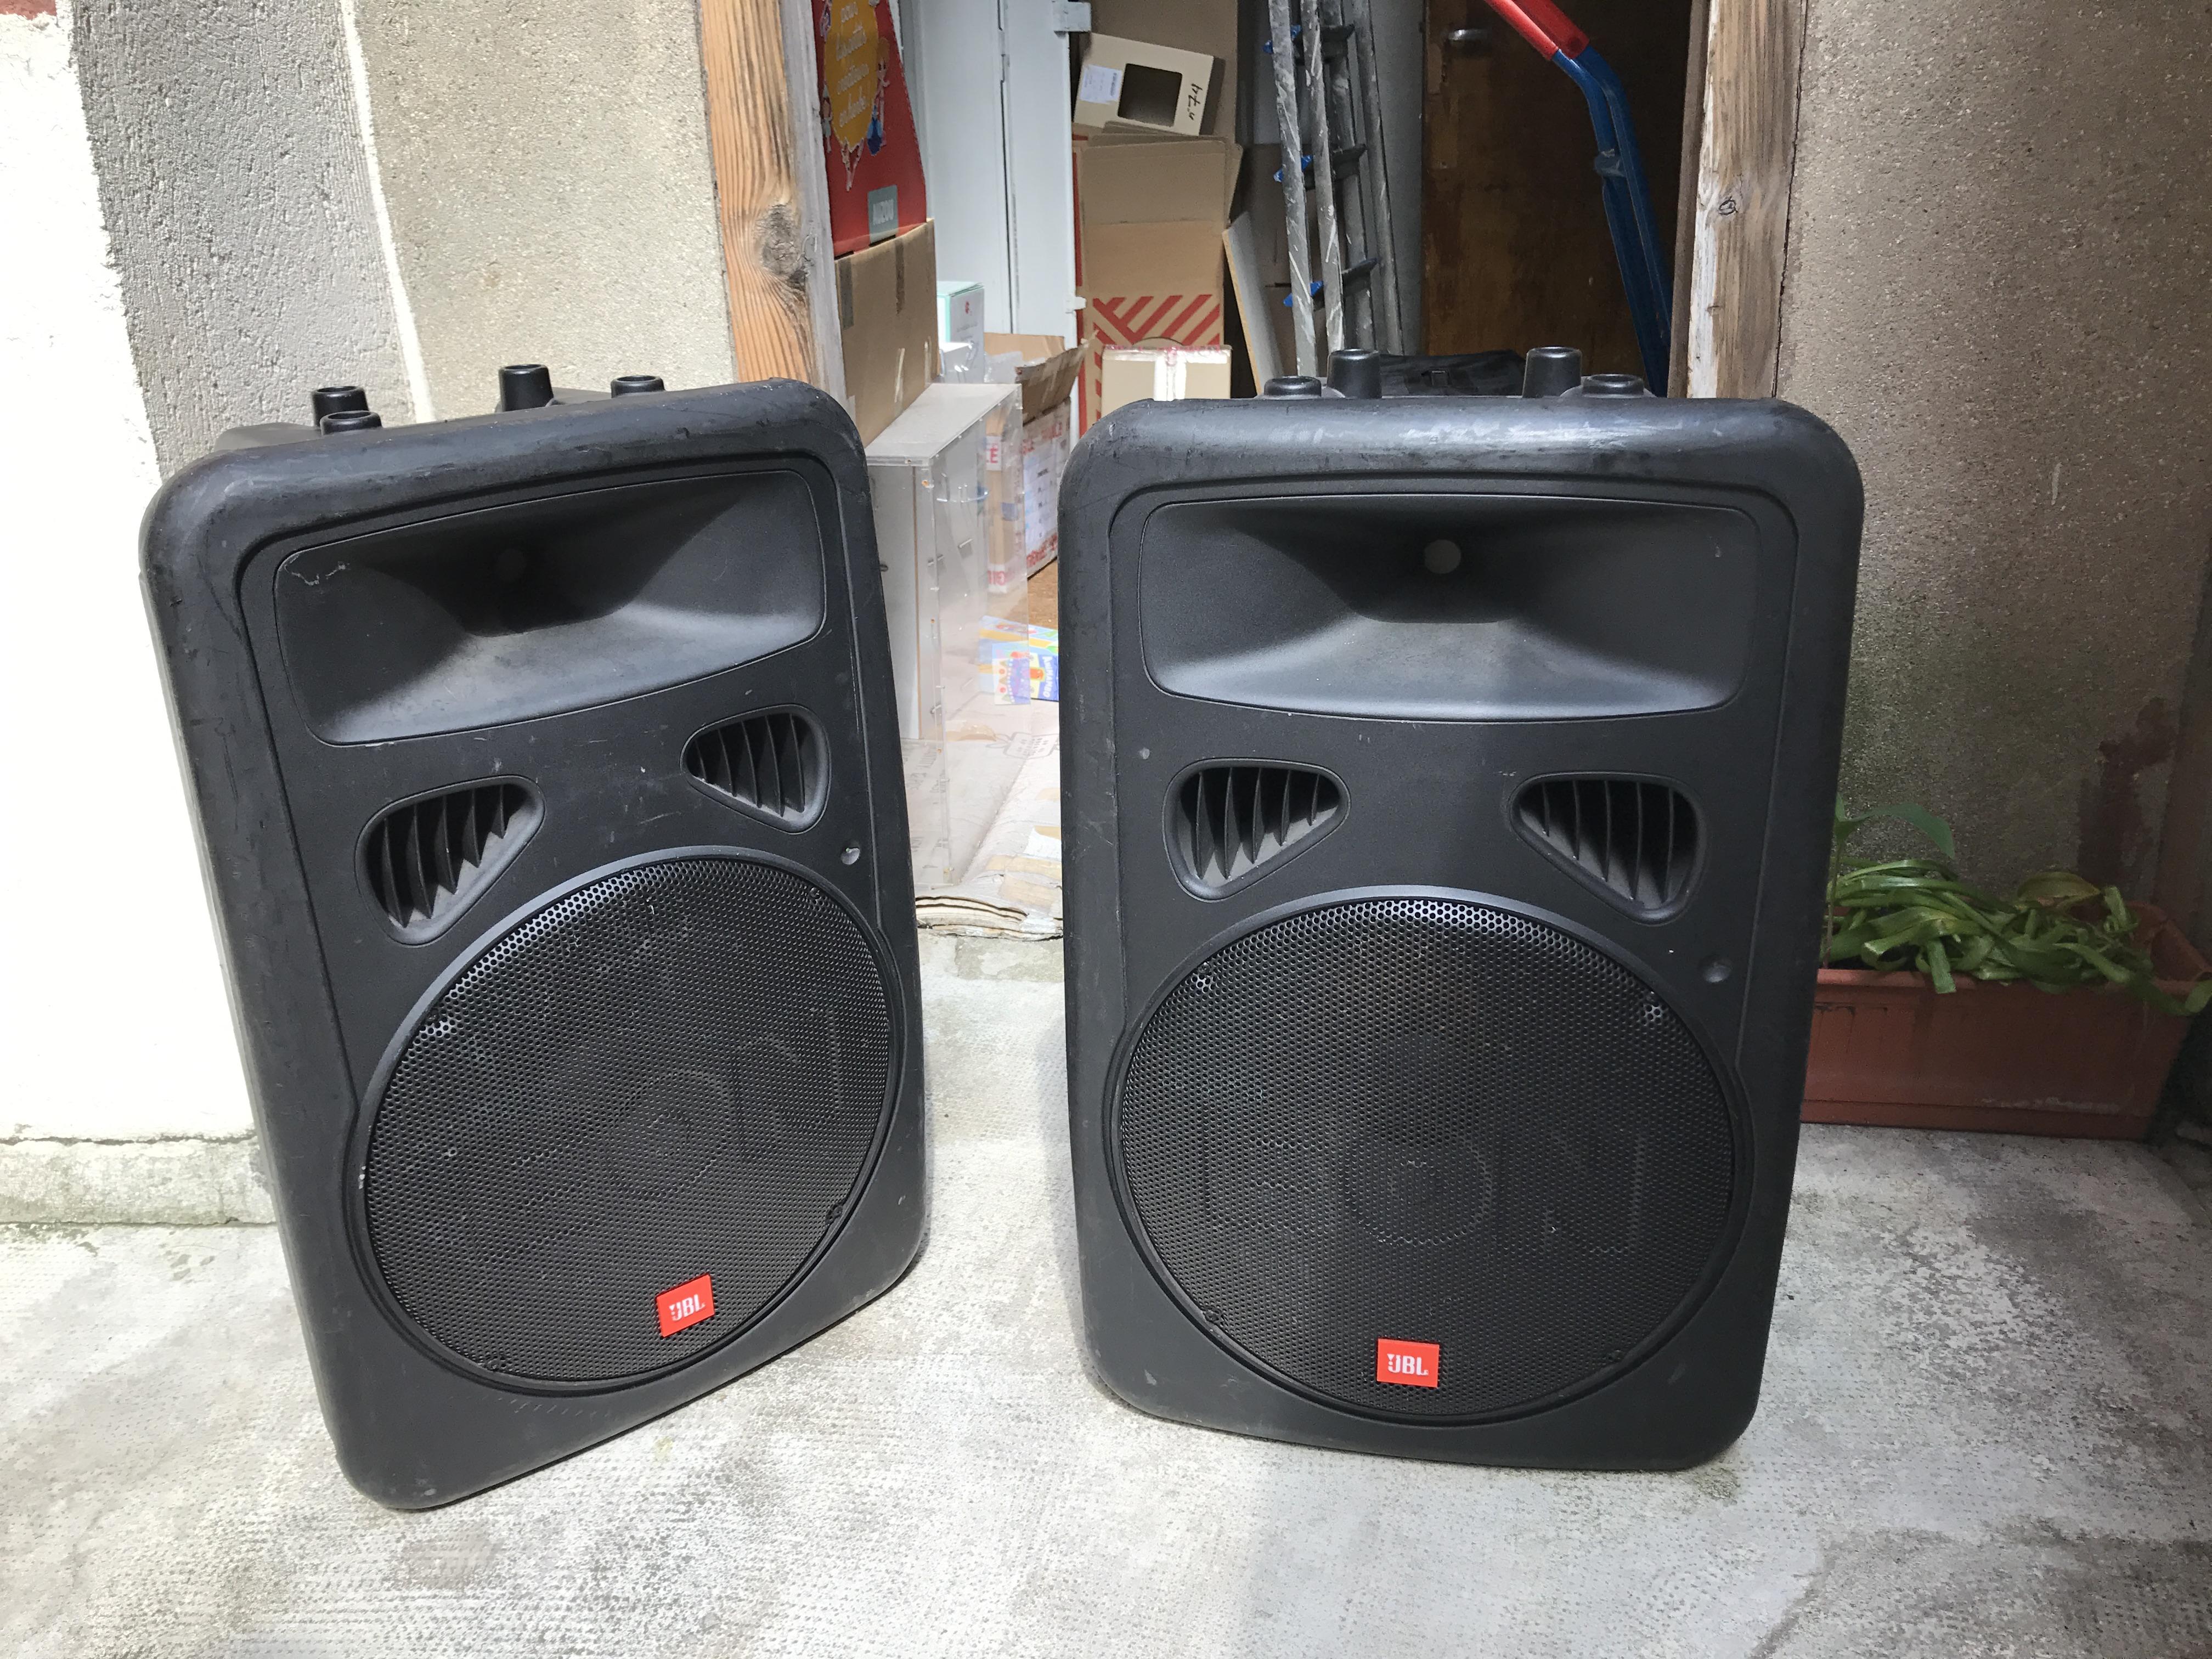 eon 15 g2 jbl eon 15 g2 audiofanzine. Black Bedroom Furniture Sets. Home Design Ideas